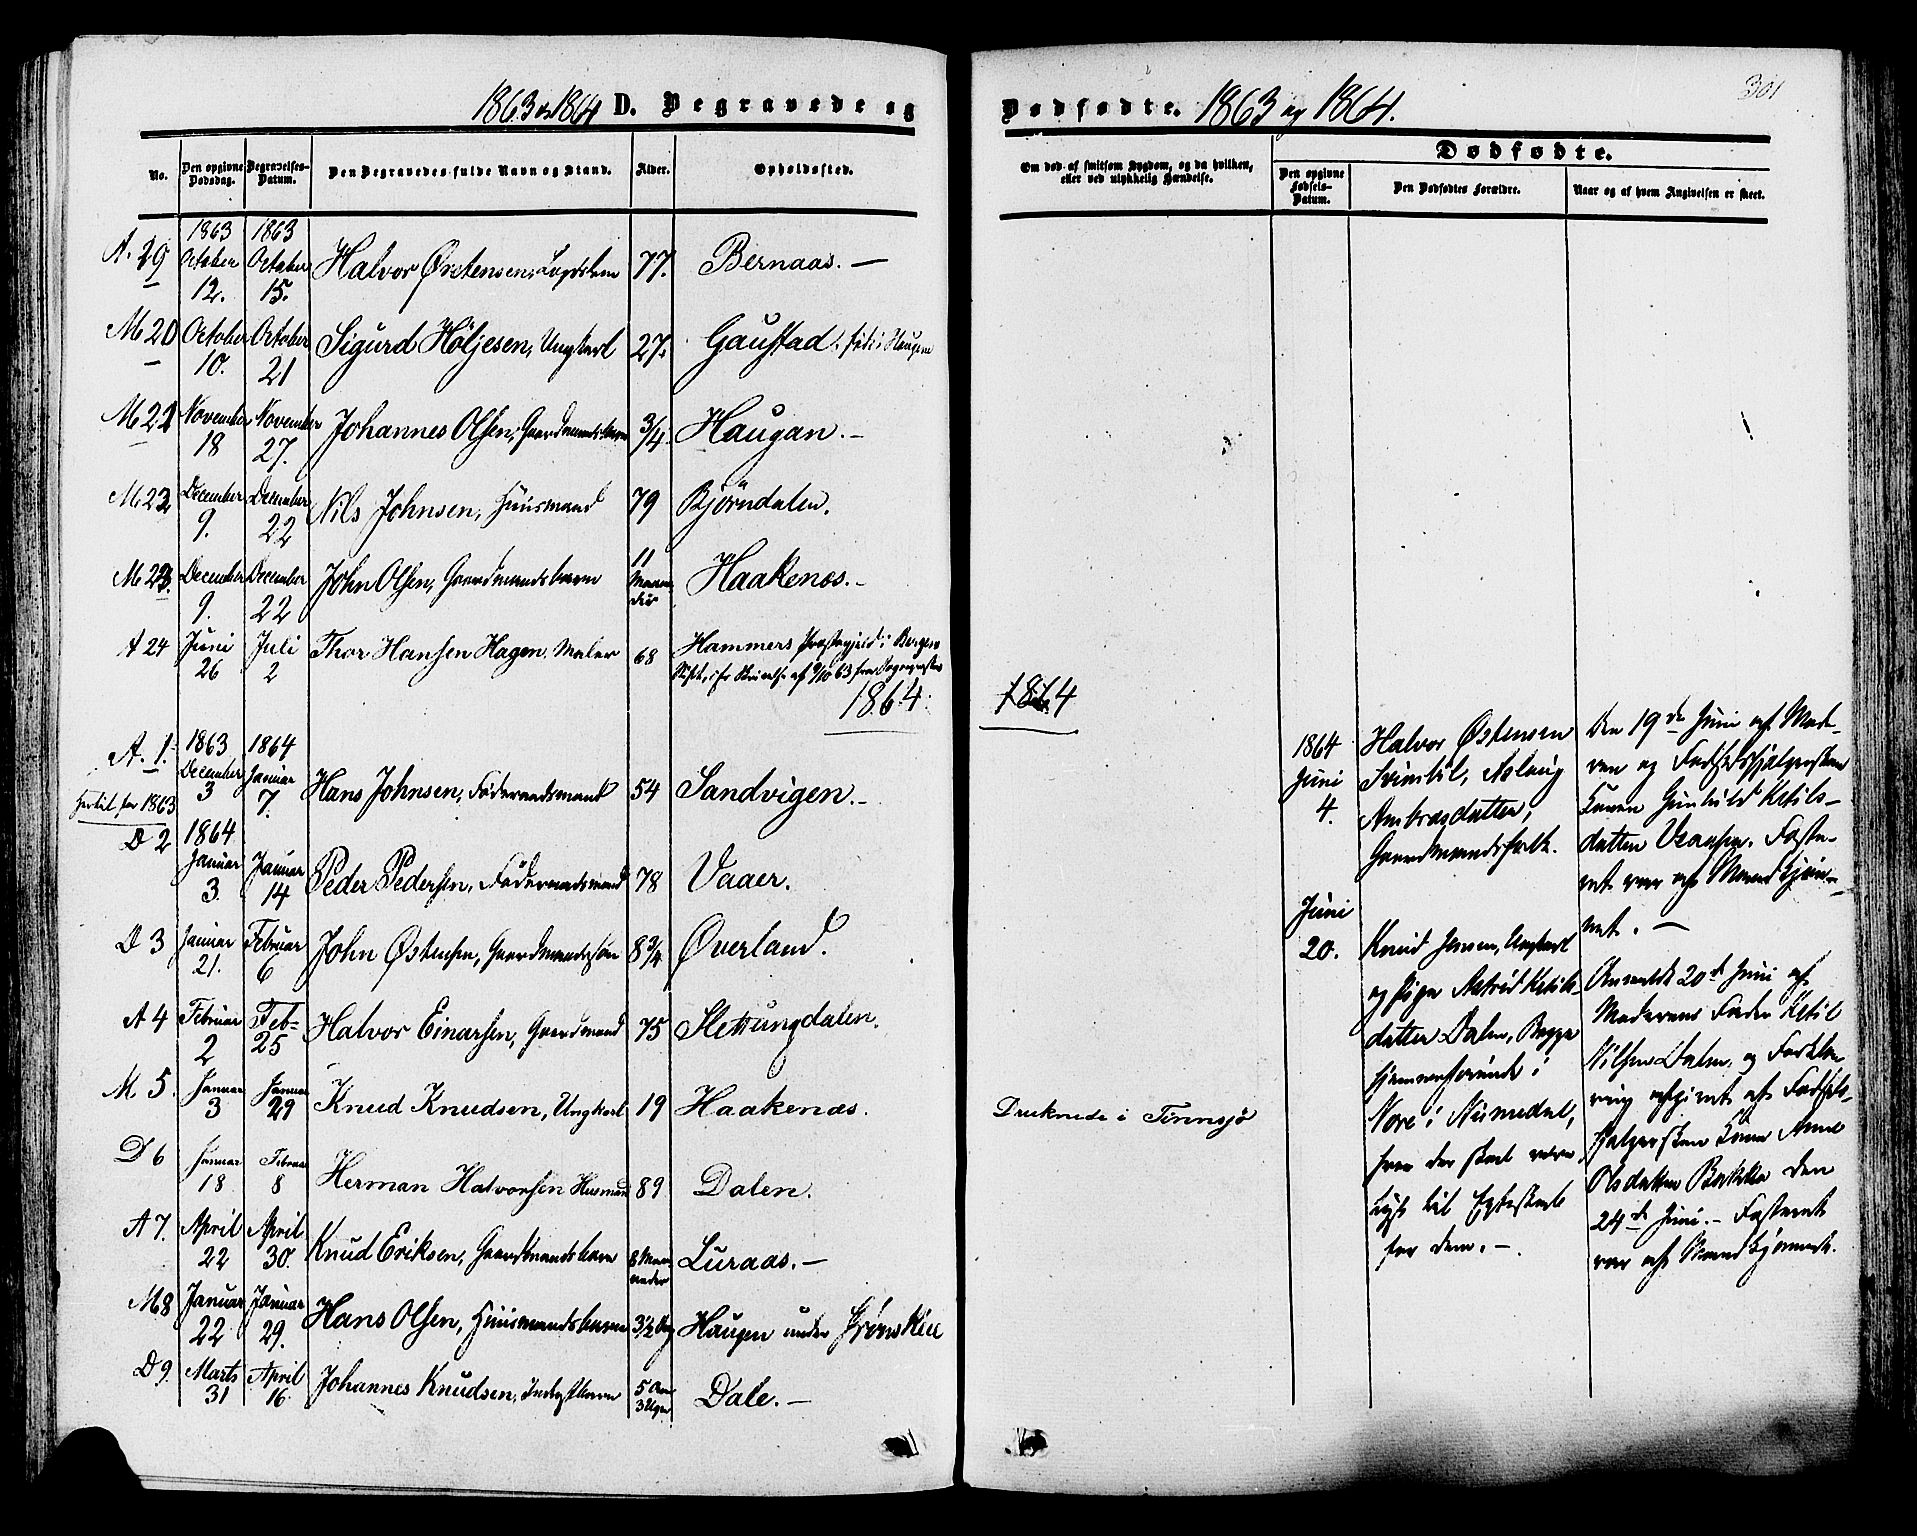 SAKO, Tinn kirkebøker, F/Fa/L0006: Ministerialbok nr. I 6, 1857-1878, s. 301